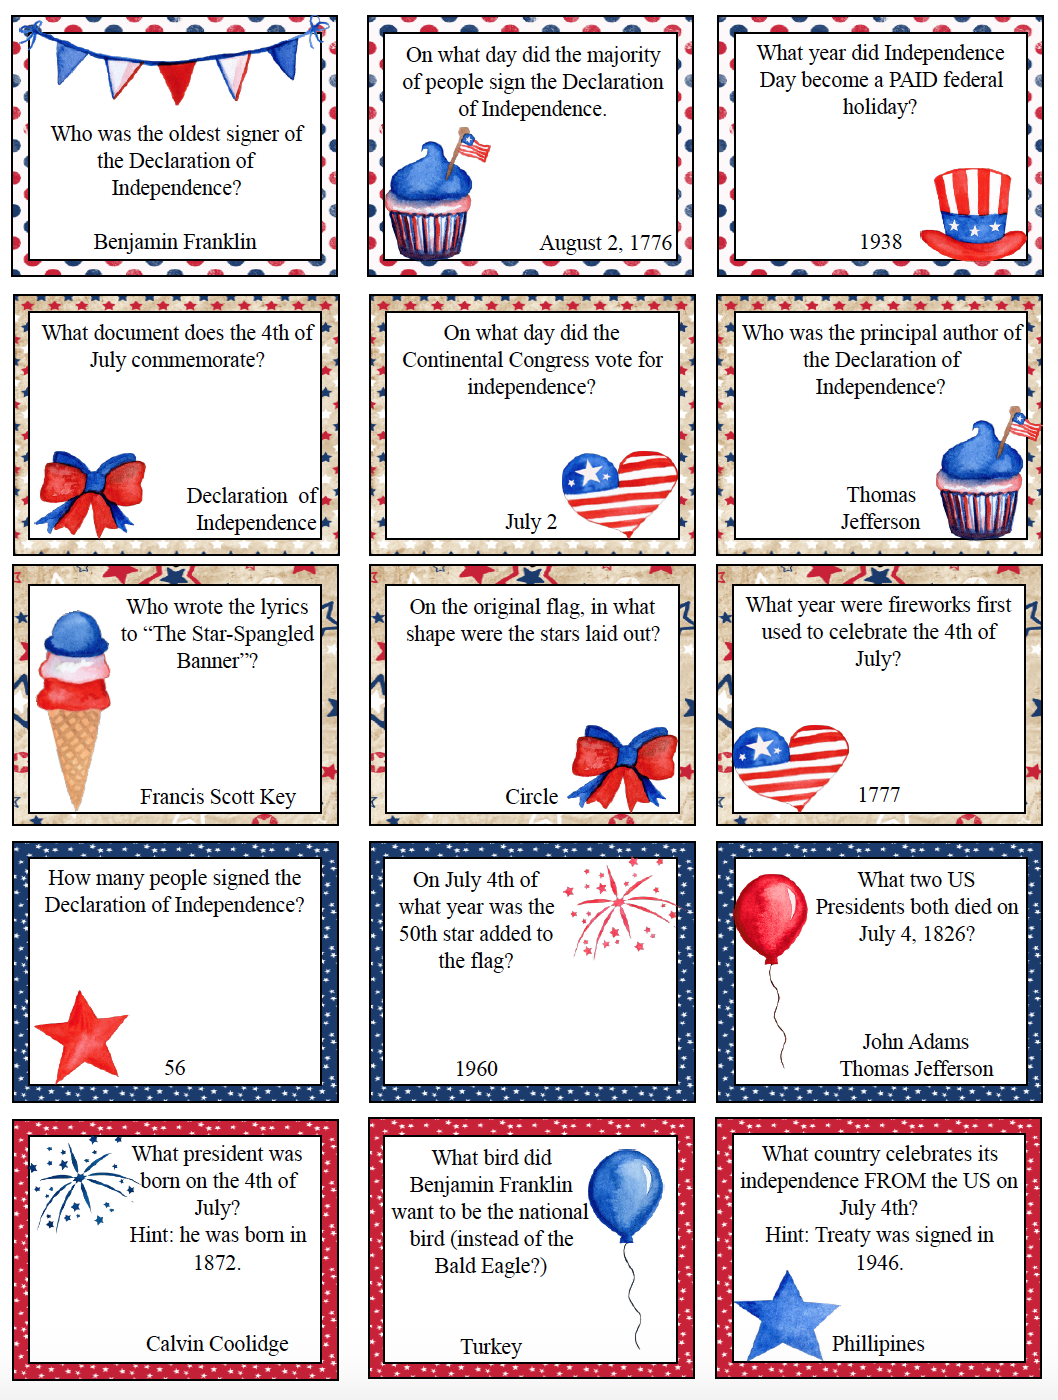 Free Printable 4th of July Trivia. Add some fun to any July 4th with free printable Fourth of July trivia. 30 patriotic questions. #free #printable #freeprintable #july4 #july4trivia #fourthofjulytrivia